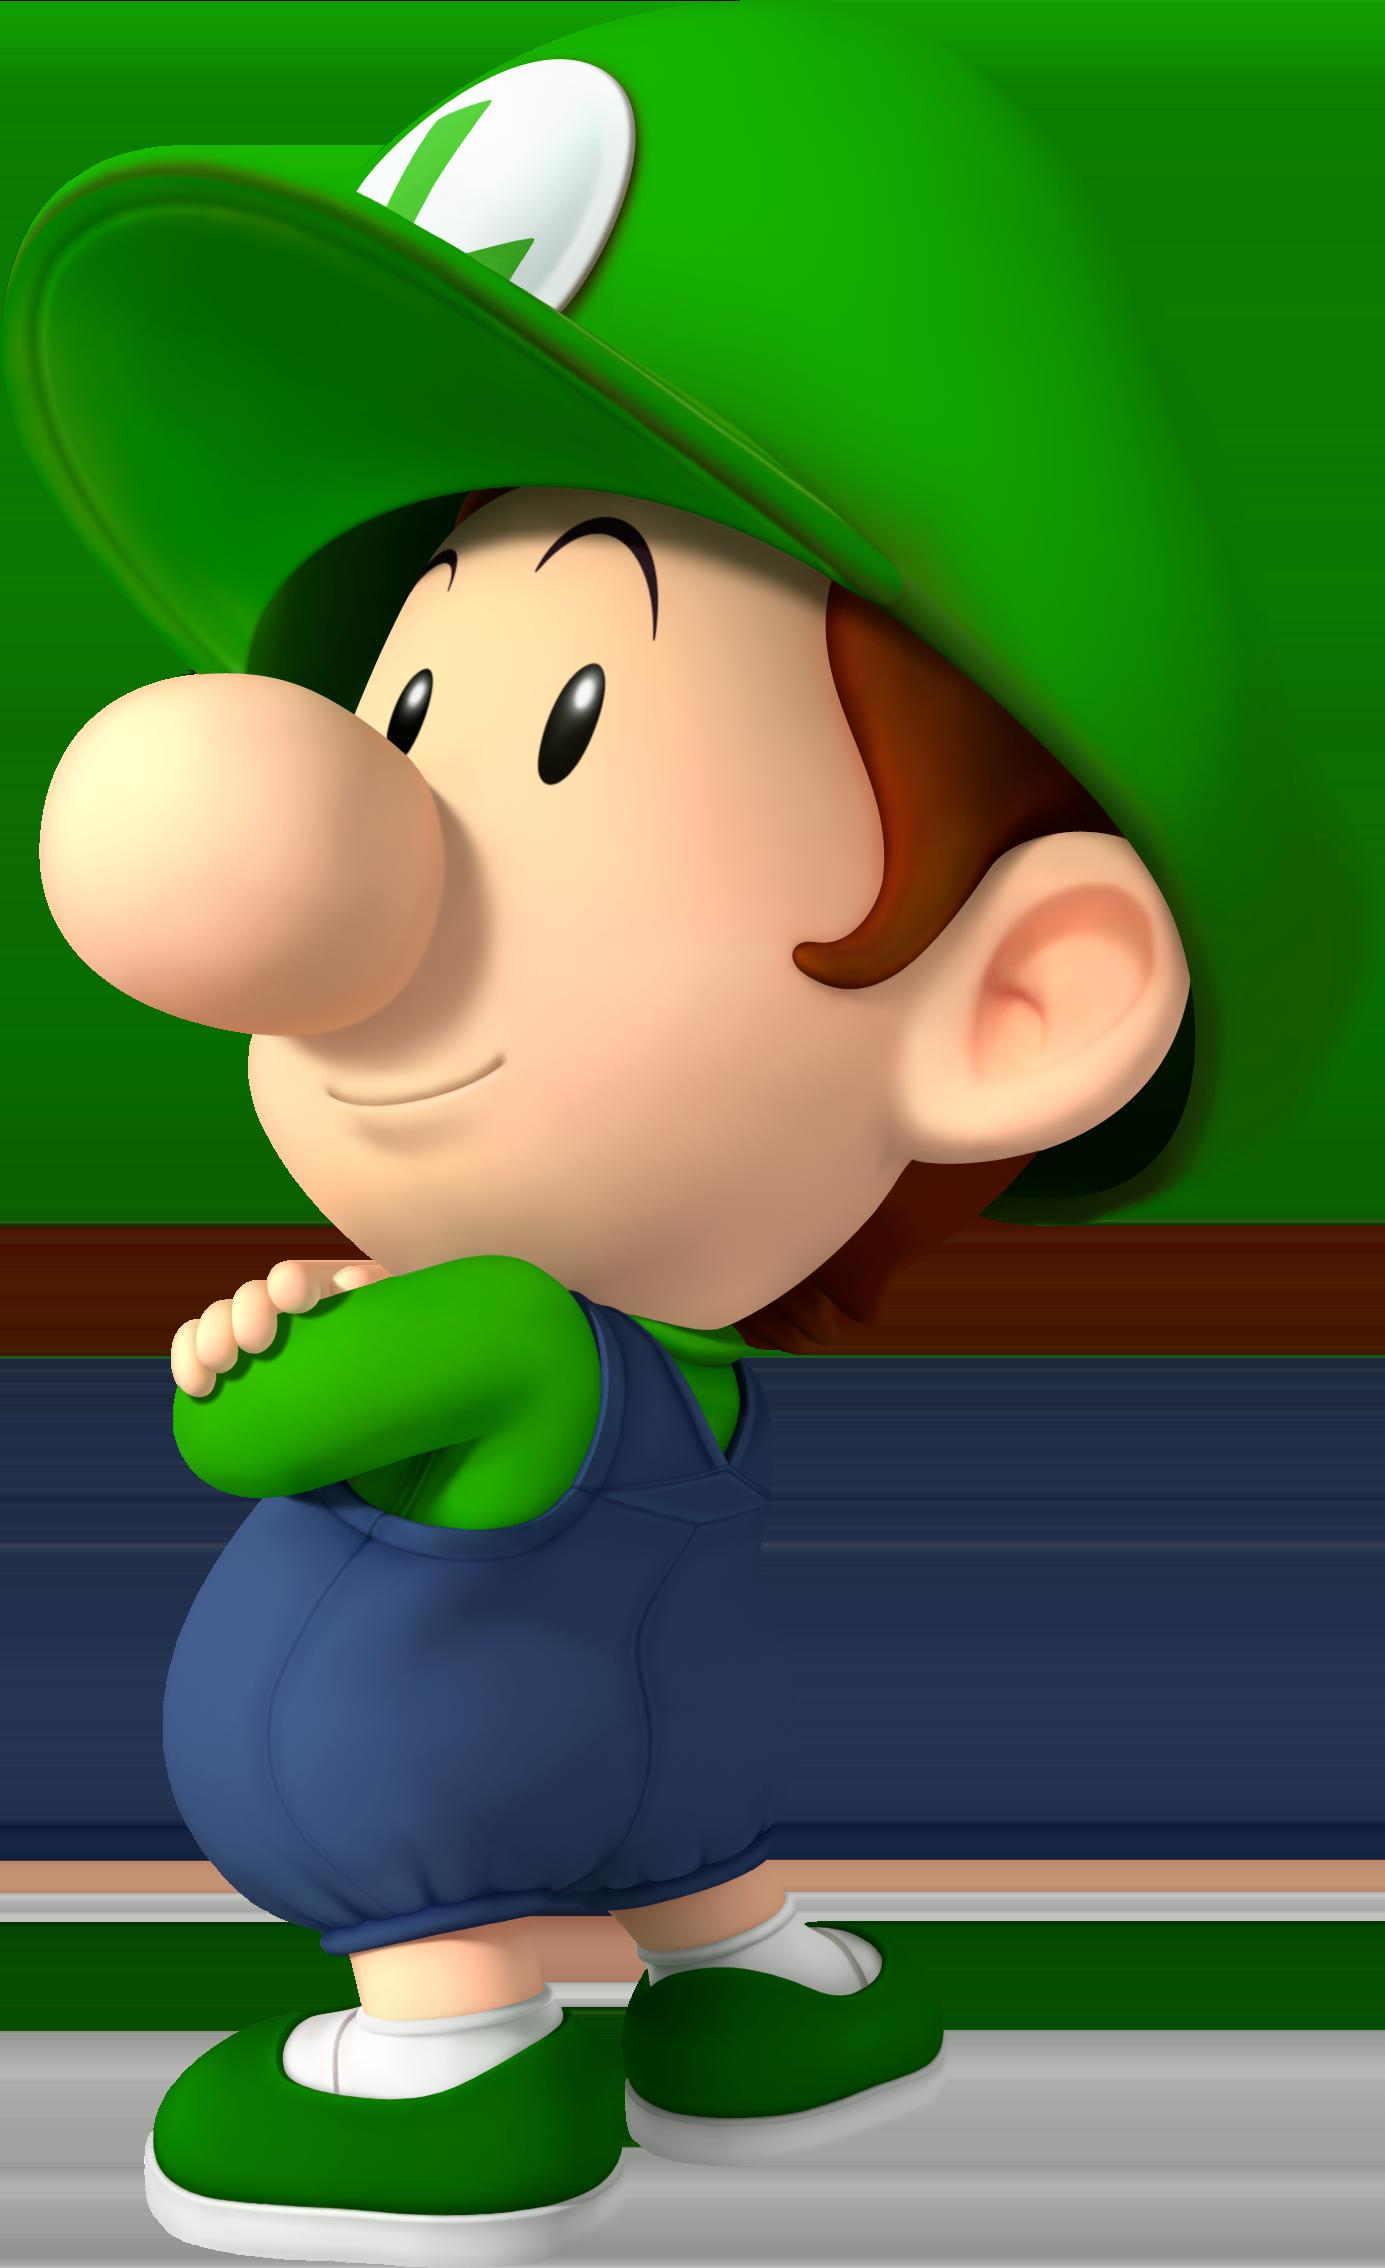 Baby Luigi Luigis Artwork In Mario Kart Wii